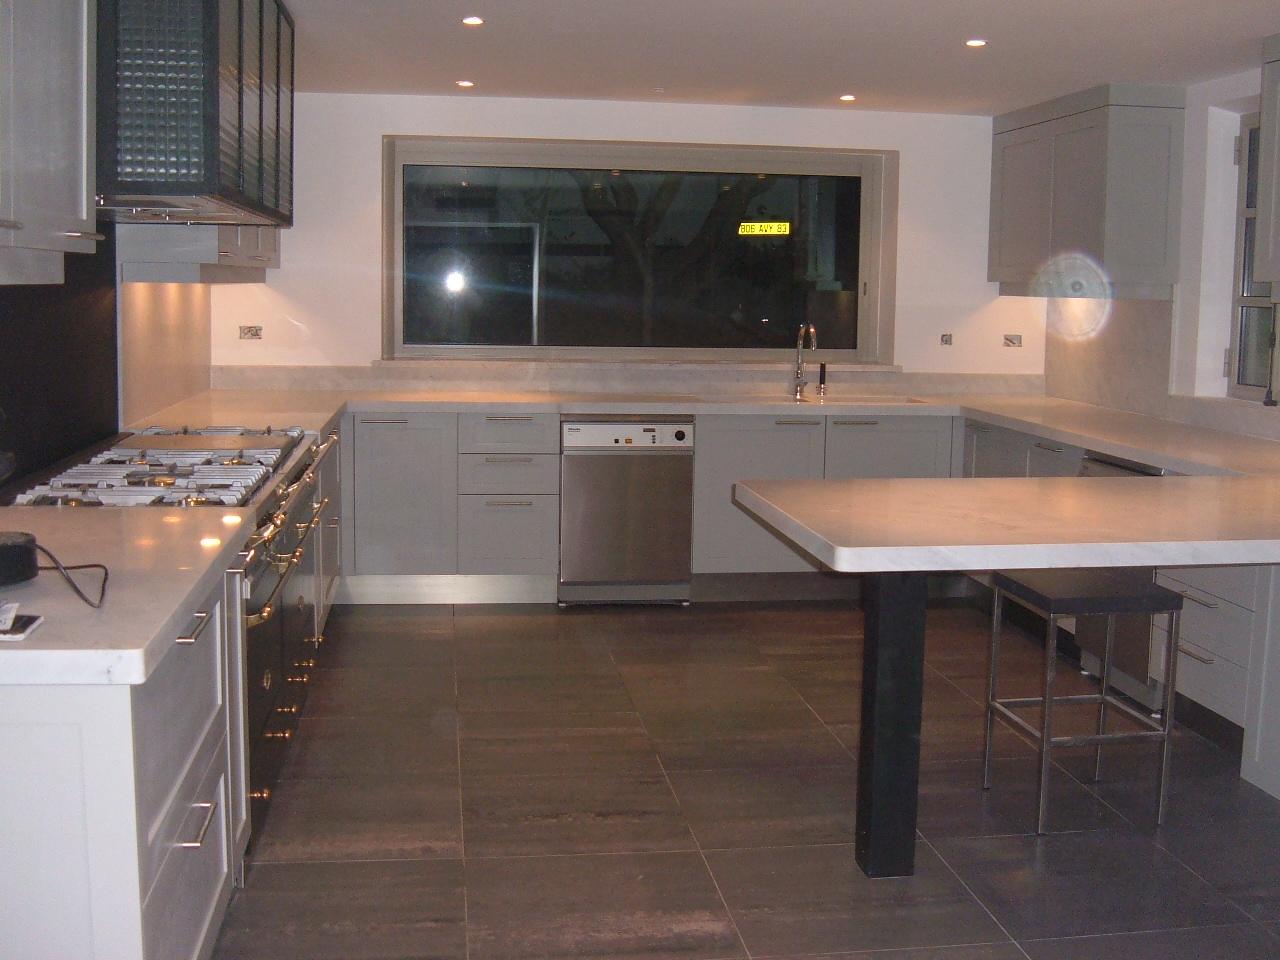 peinture pour terrasse peinture terrasse sur enperdresonlapin. Black Bedroom Furniture Sets. Home Design Ideas